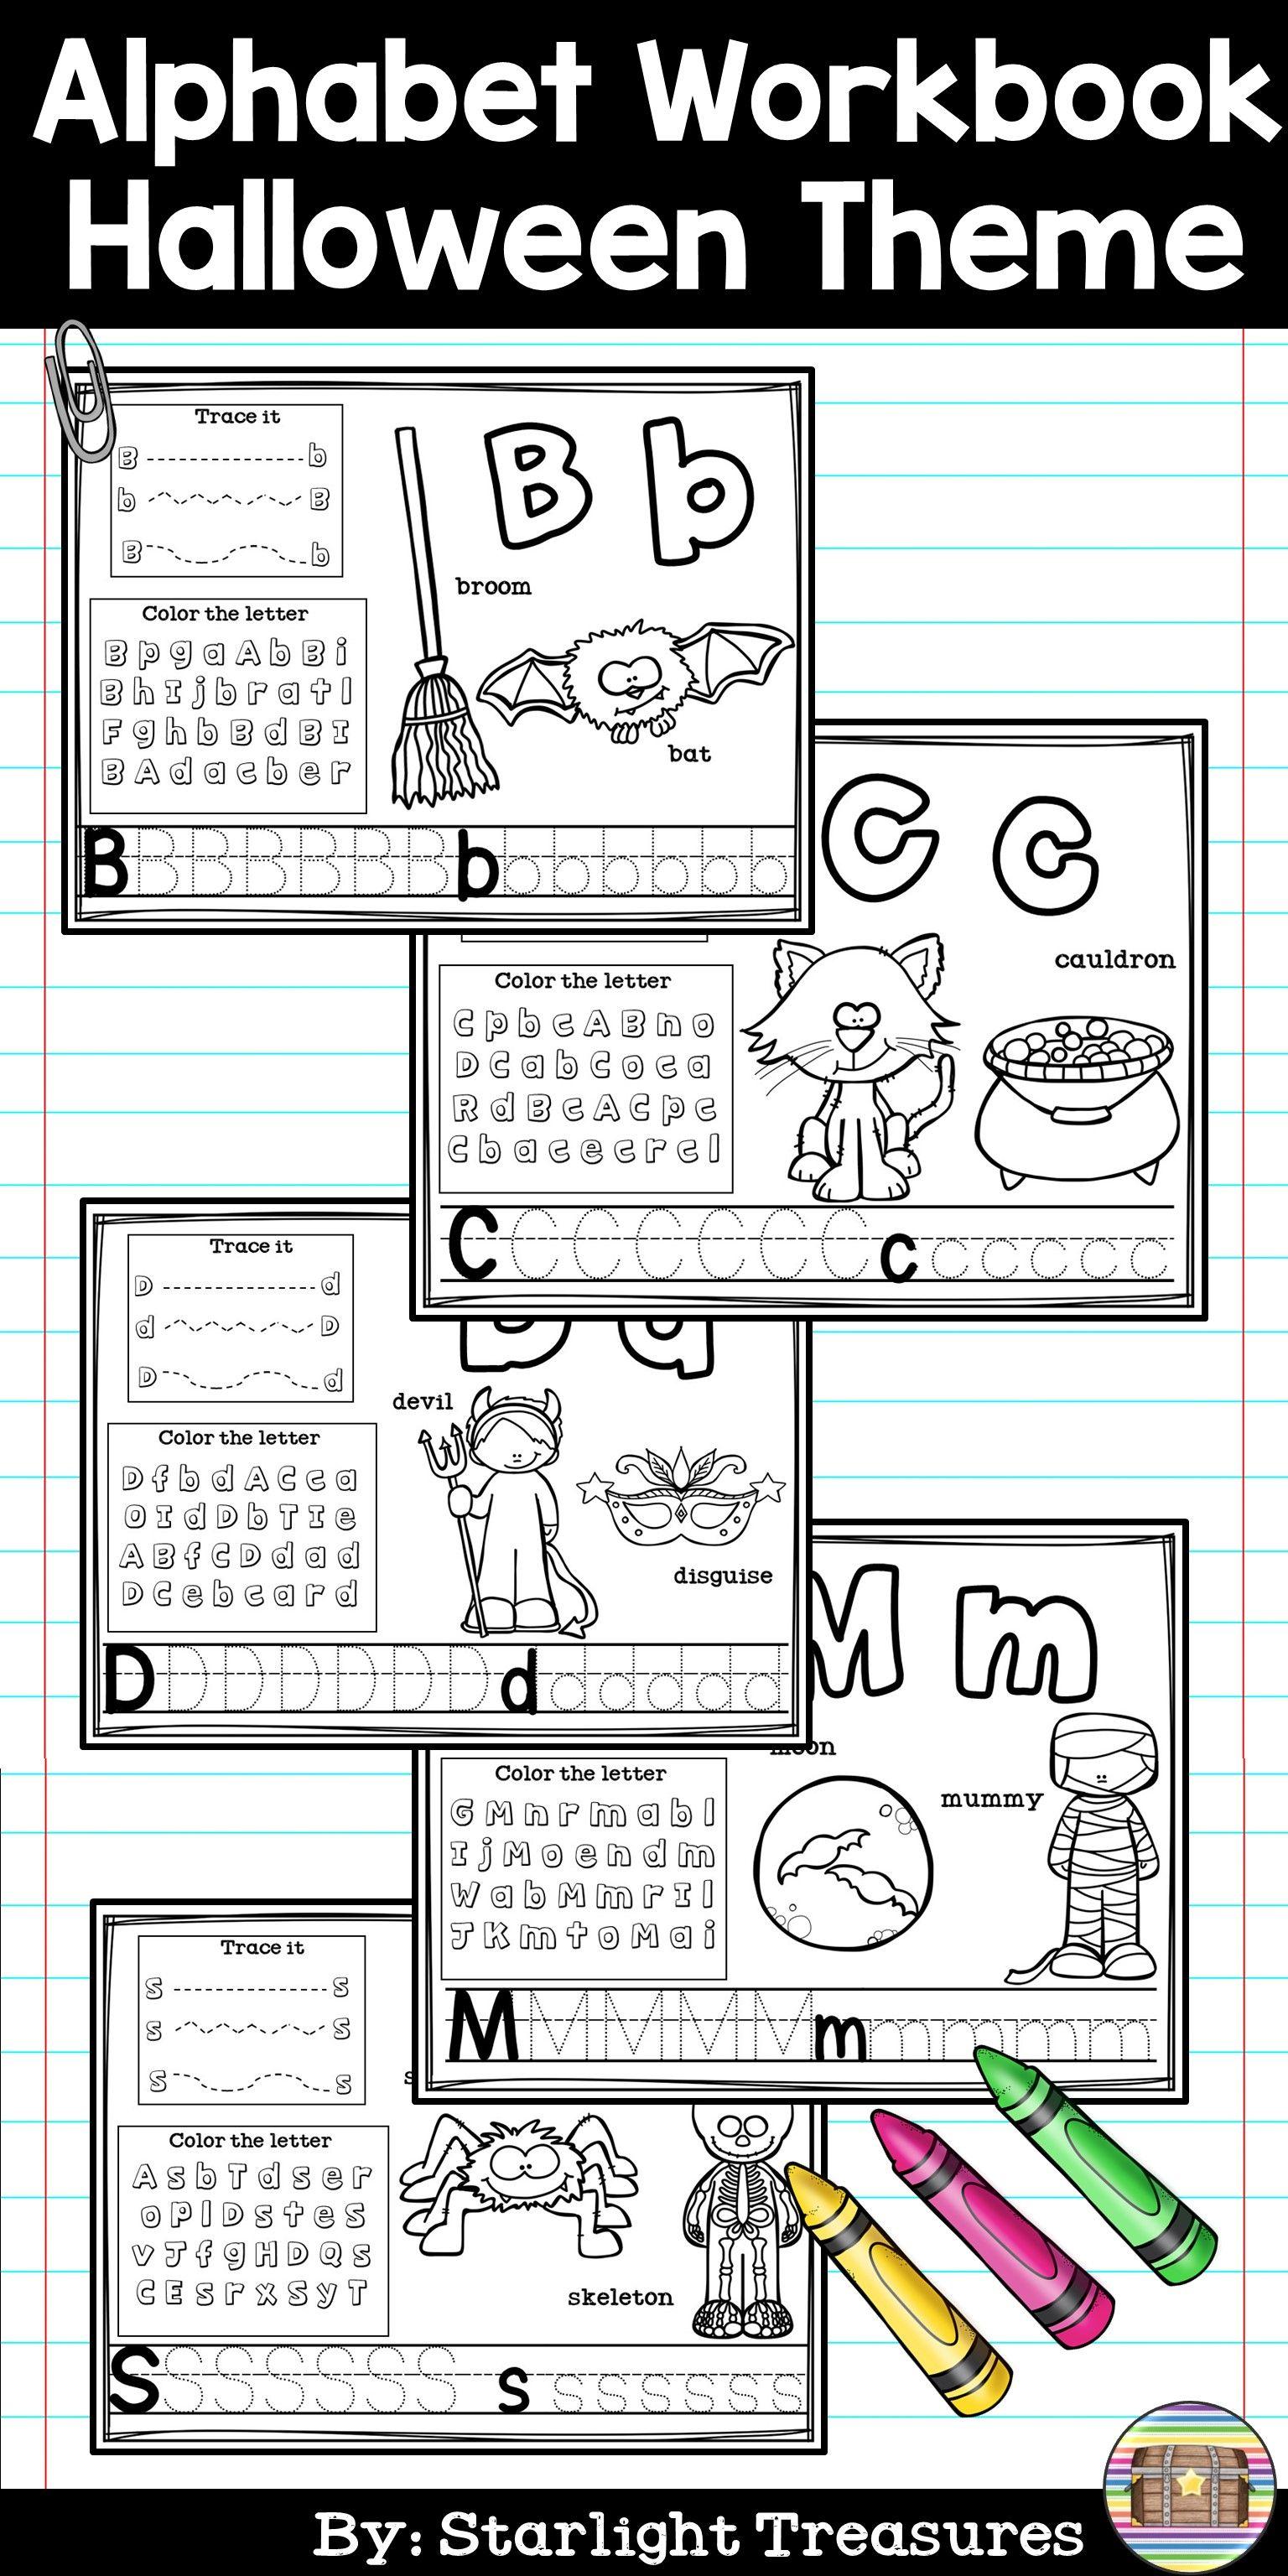 Alphabet Workbook Worksheets A Z Halloween Theme